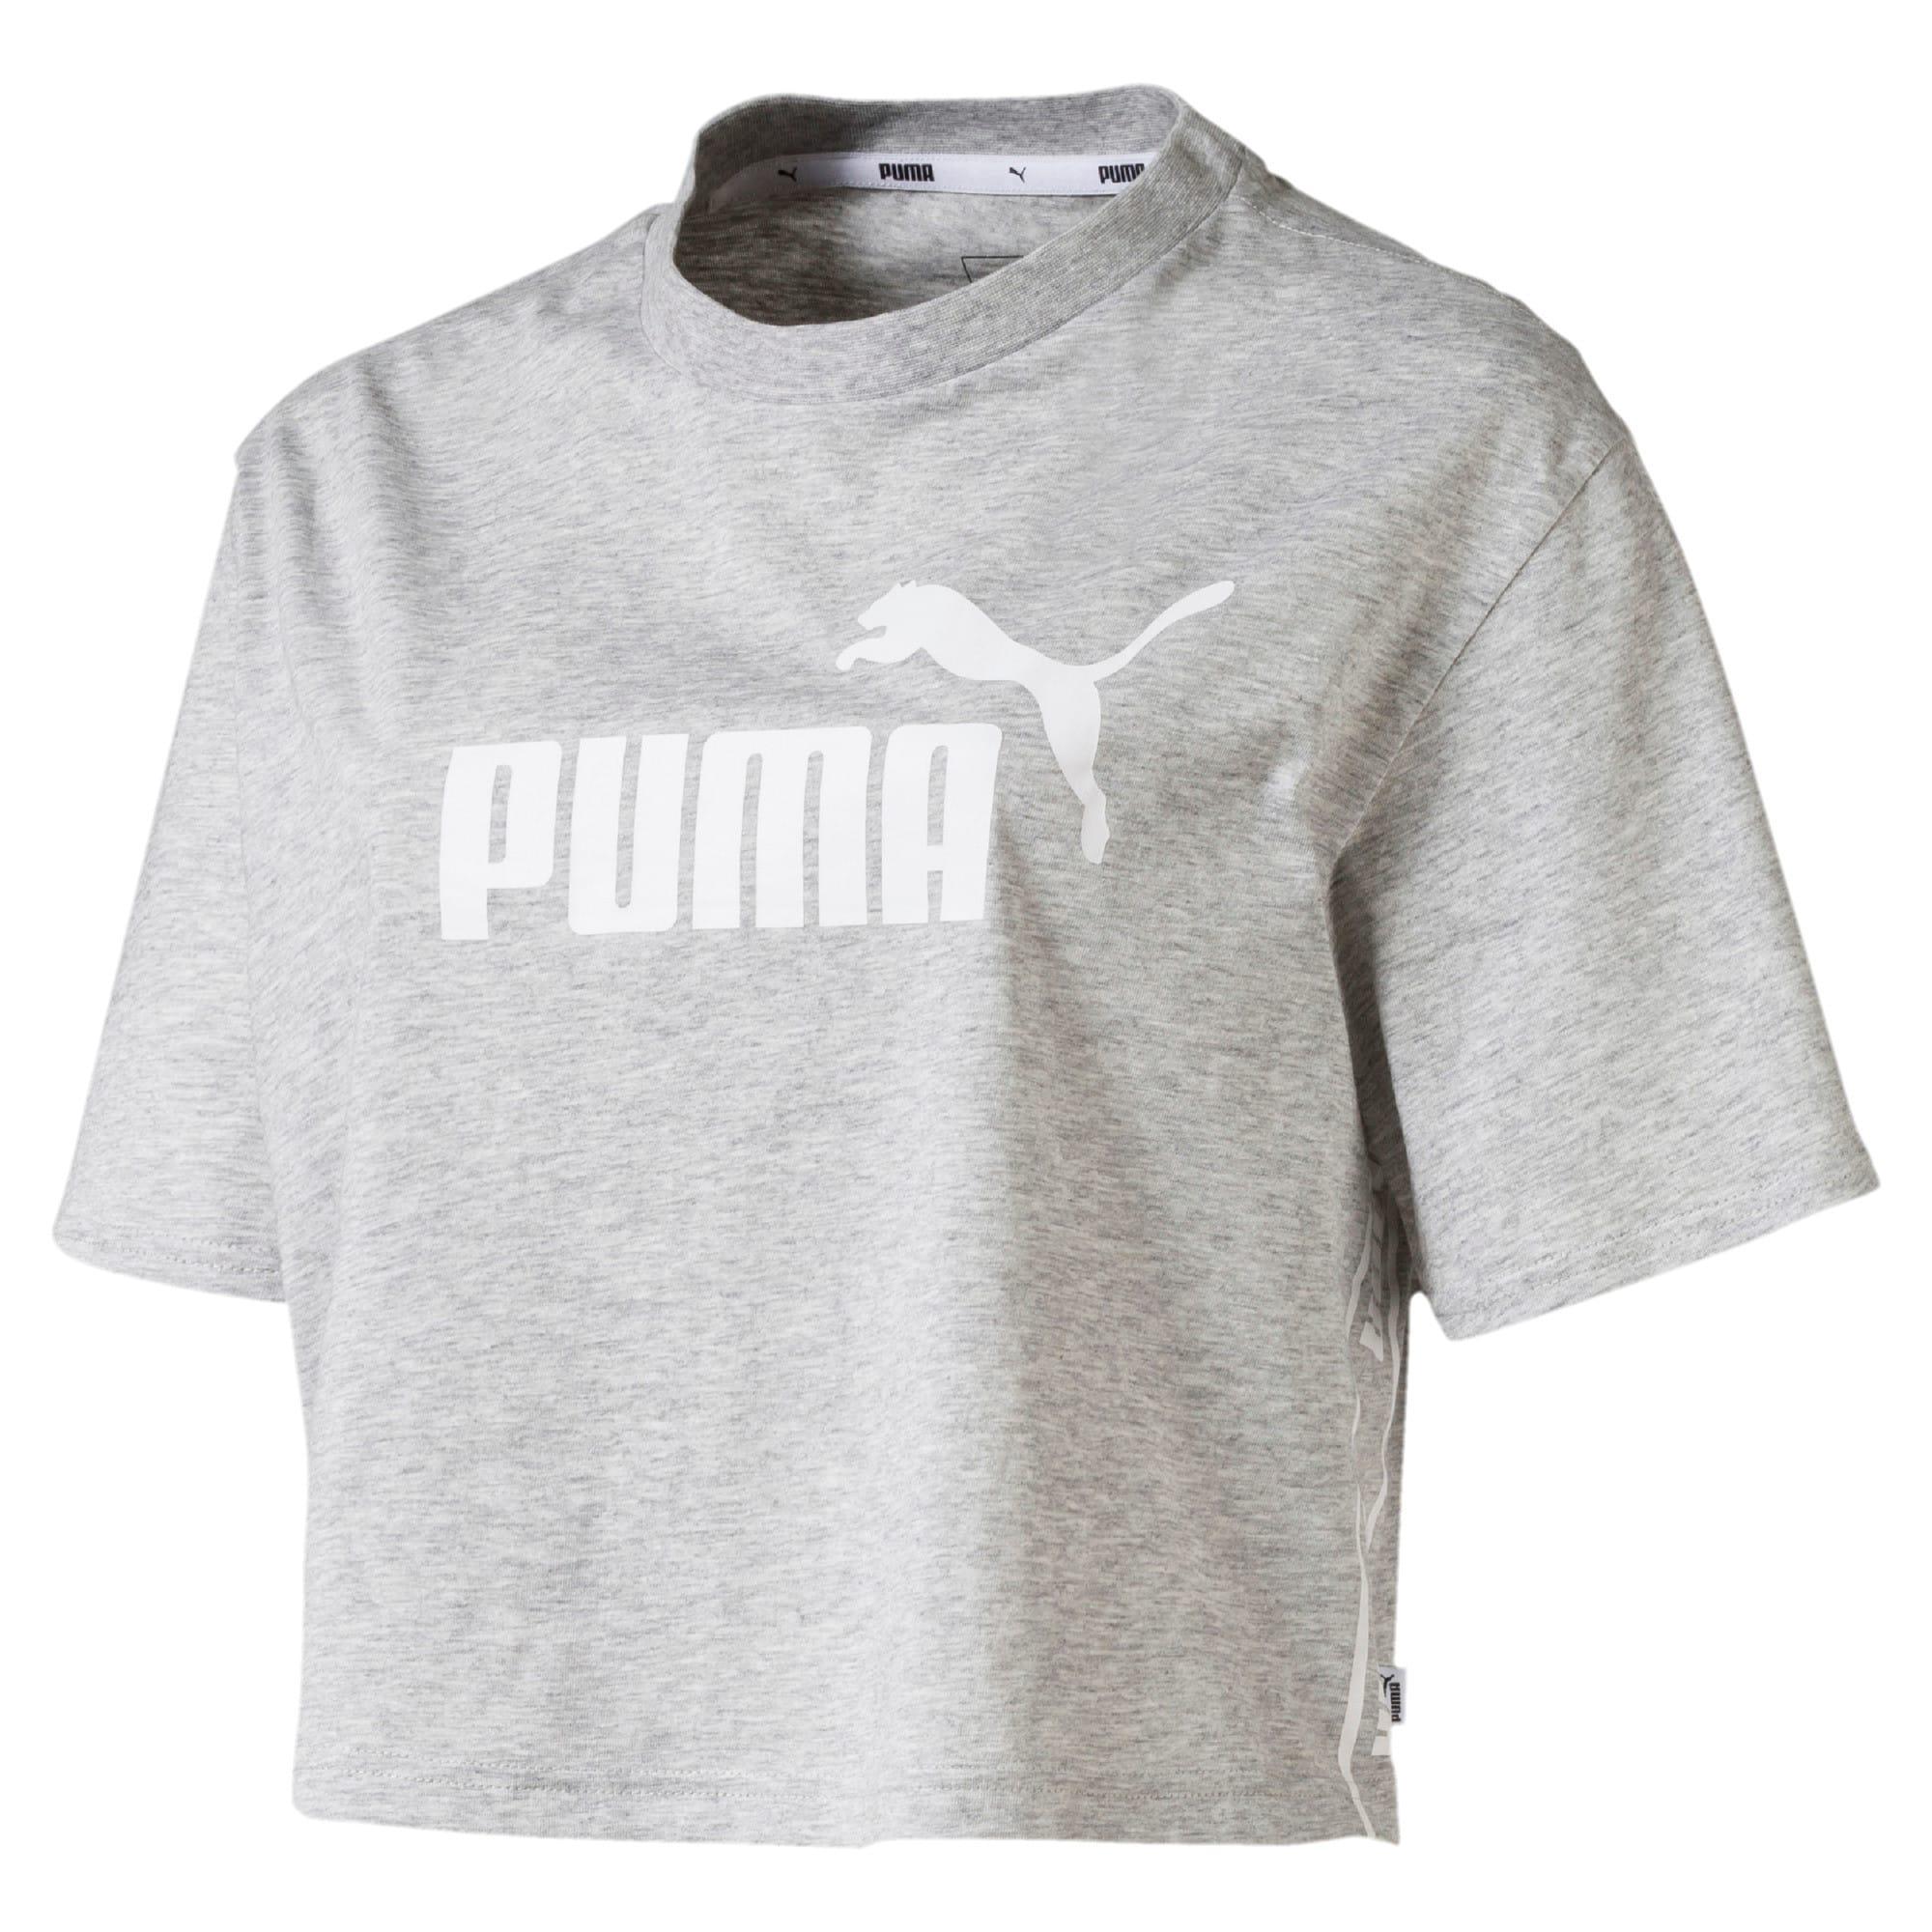 Miniatura 1 de Camiseta corta Amplified para mujer, Light Gray Heather, mediano